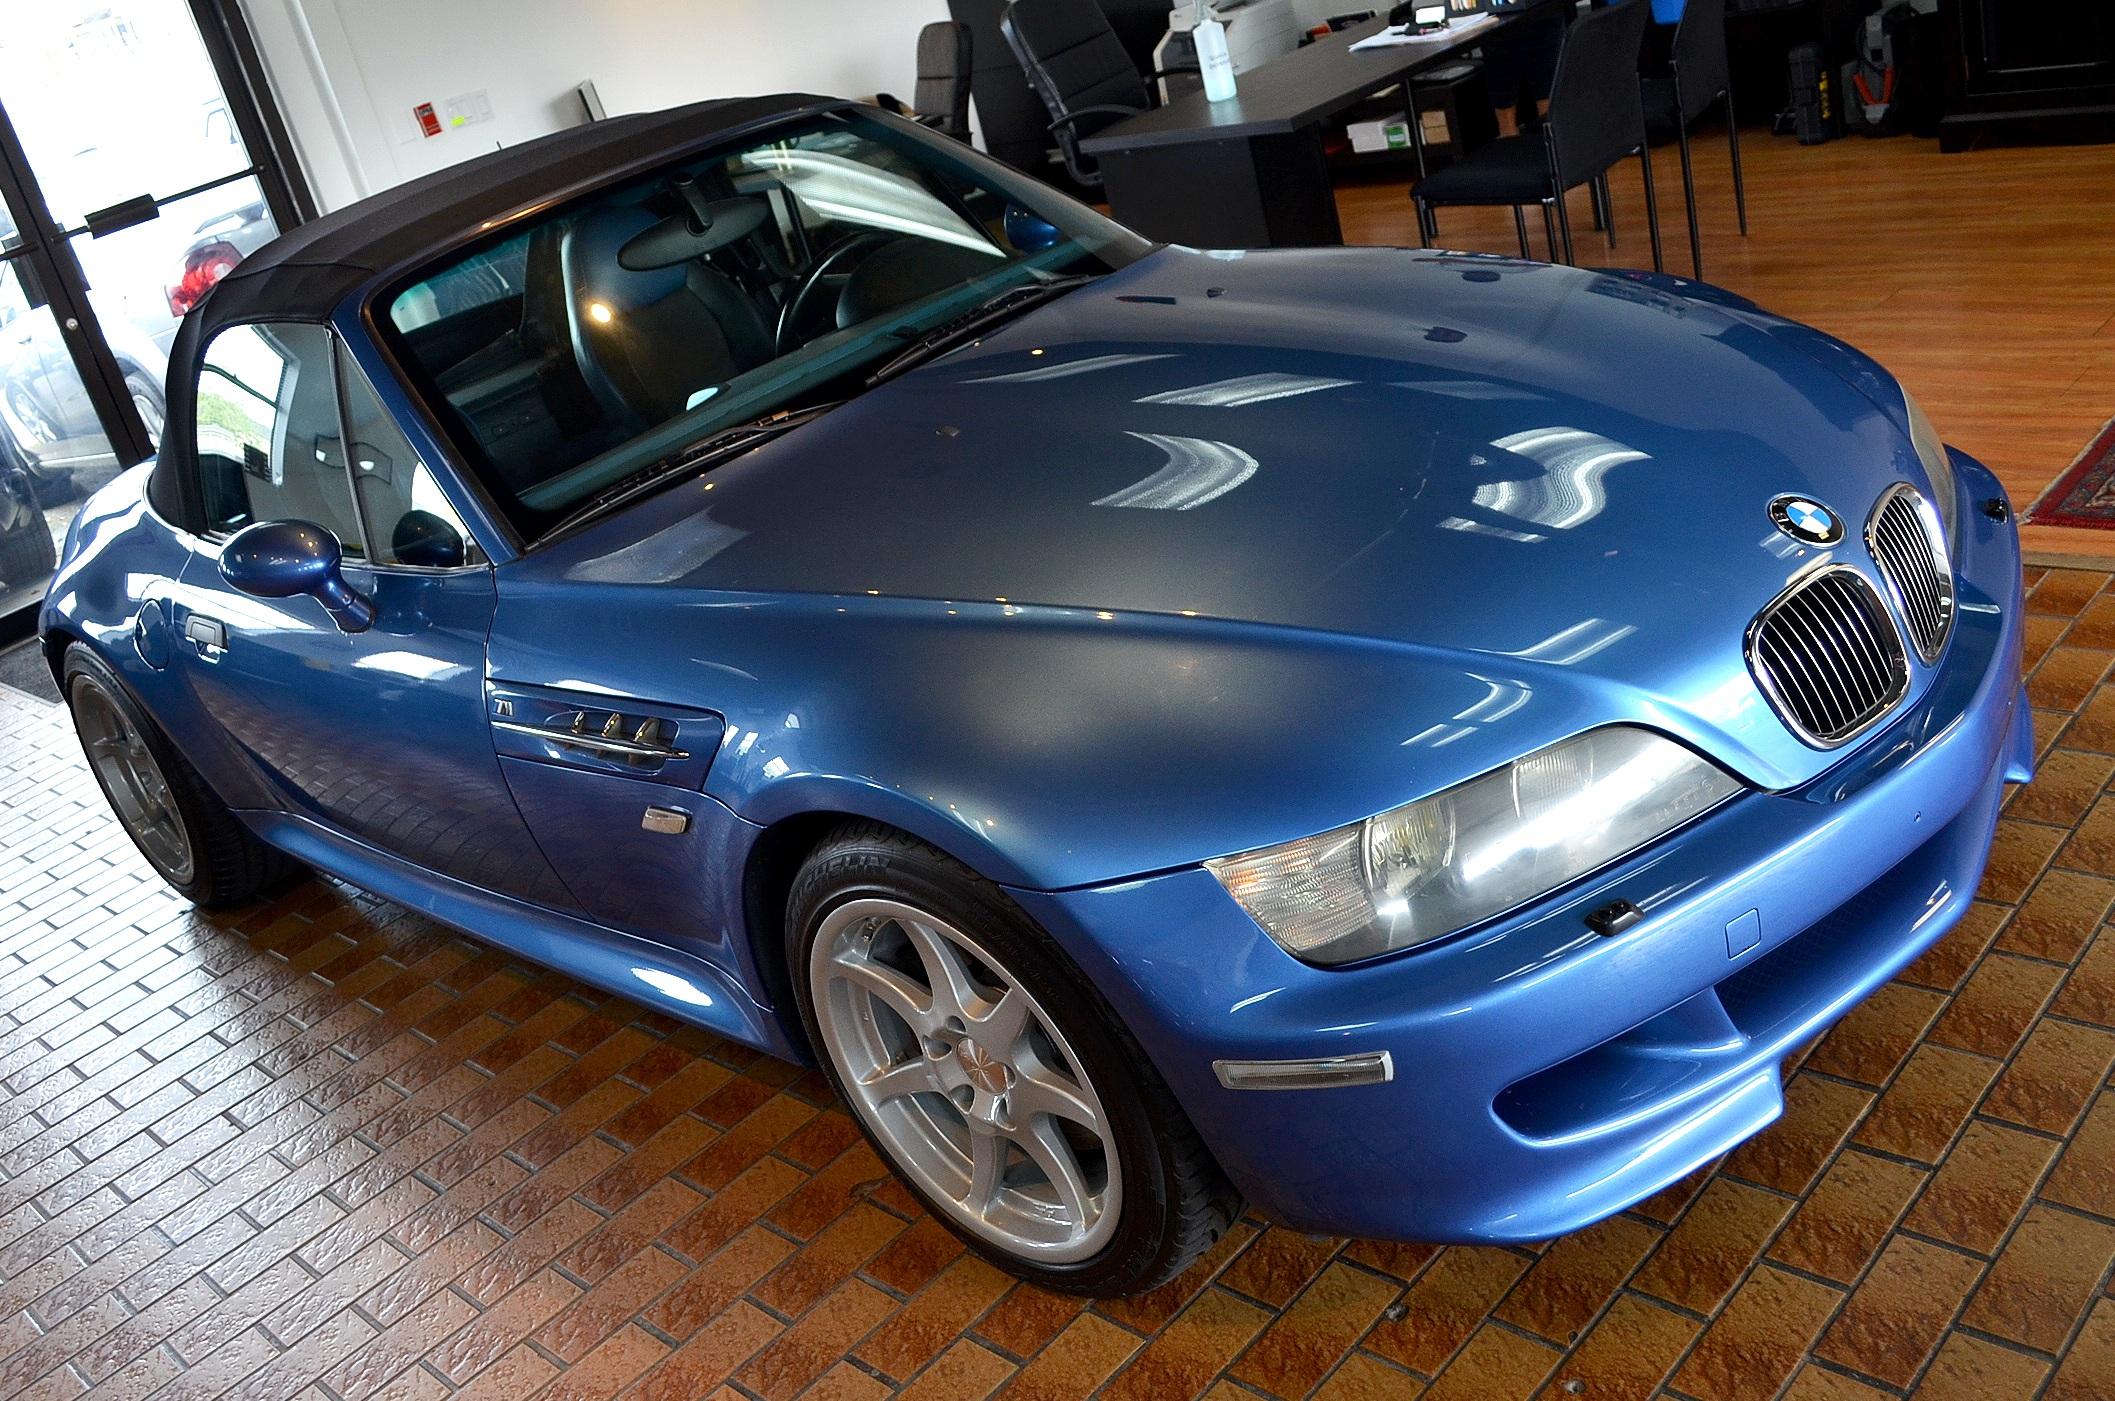 2000 BMW z3 m roadster, 5 spd -